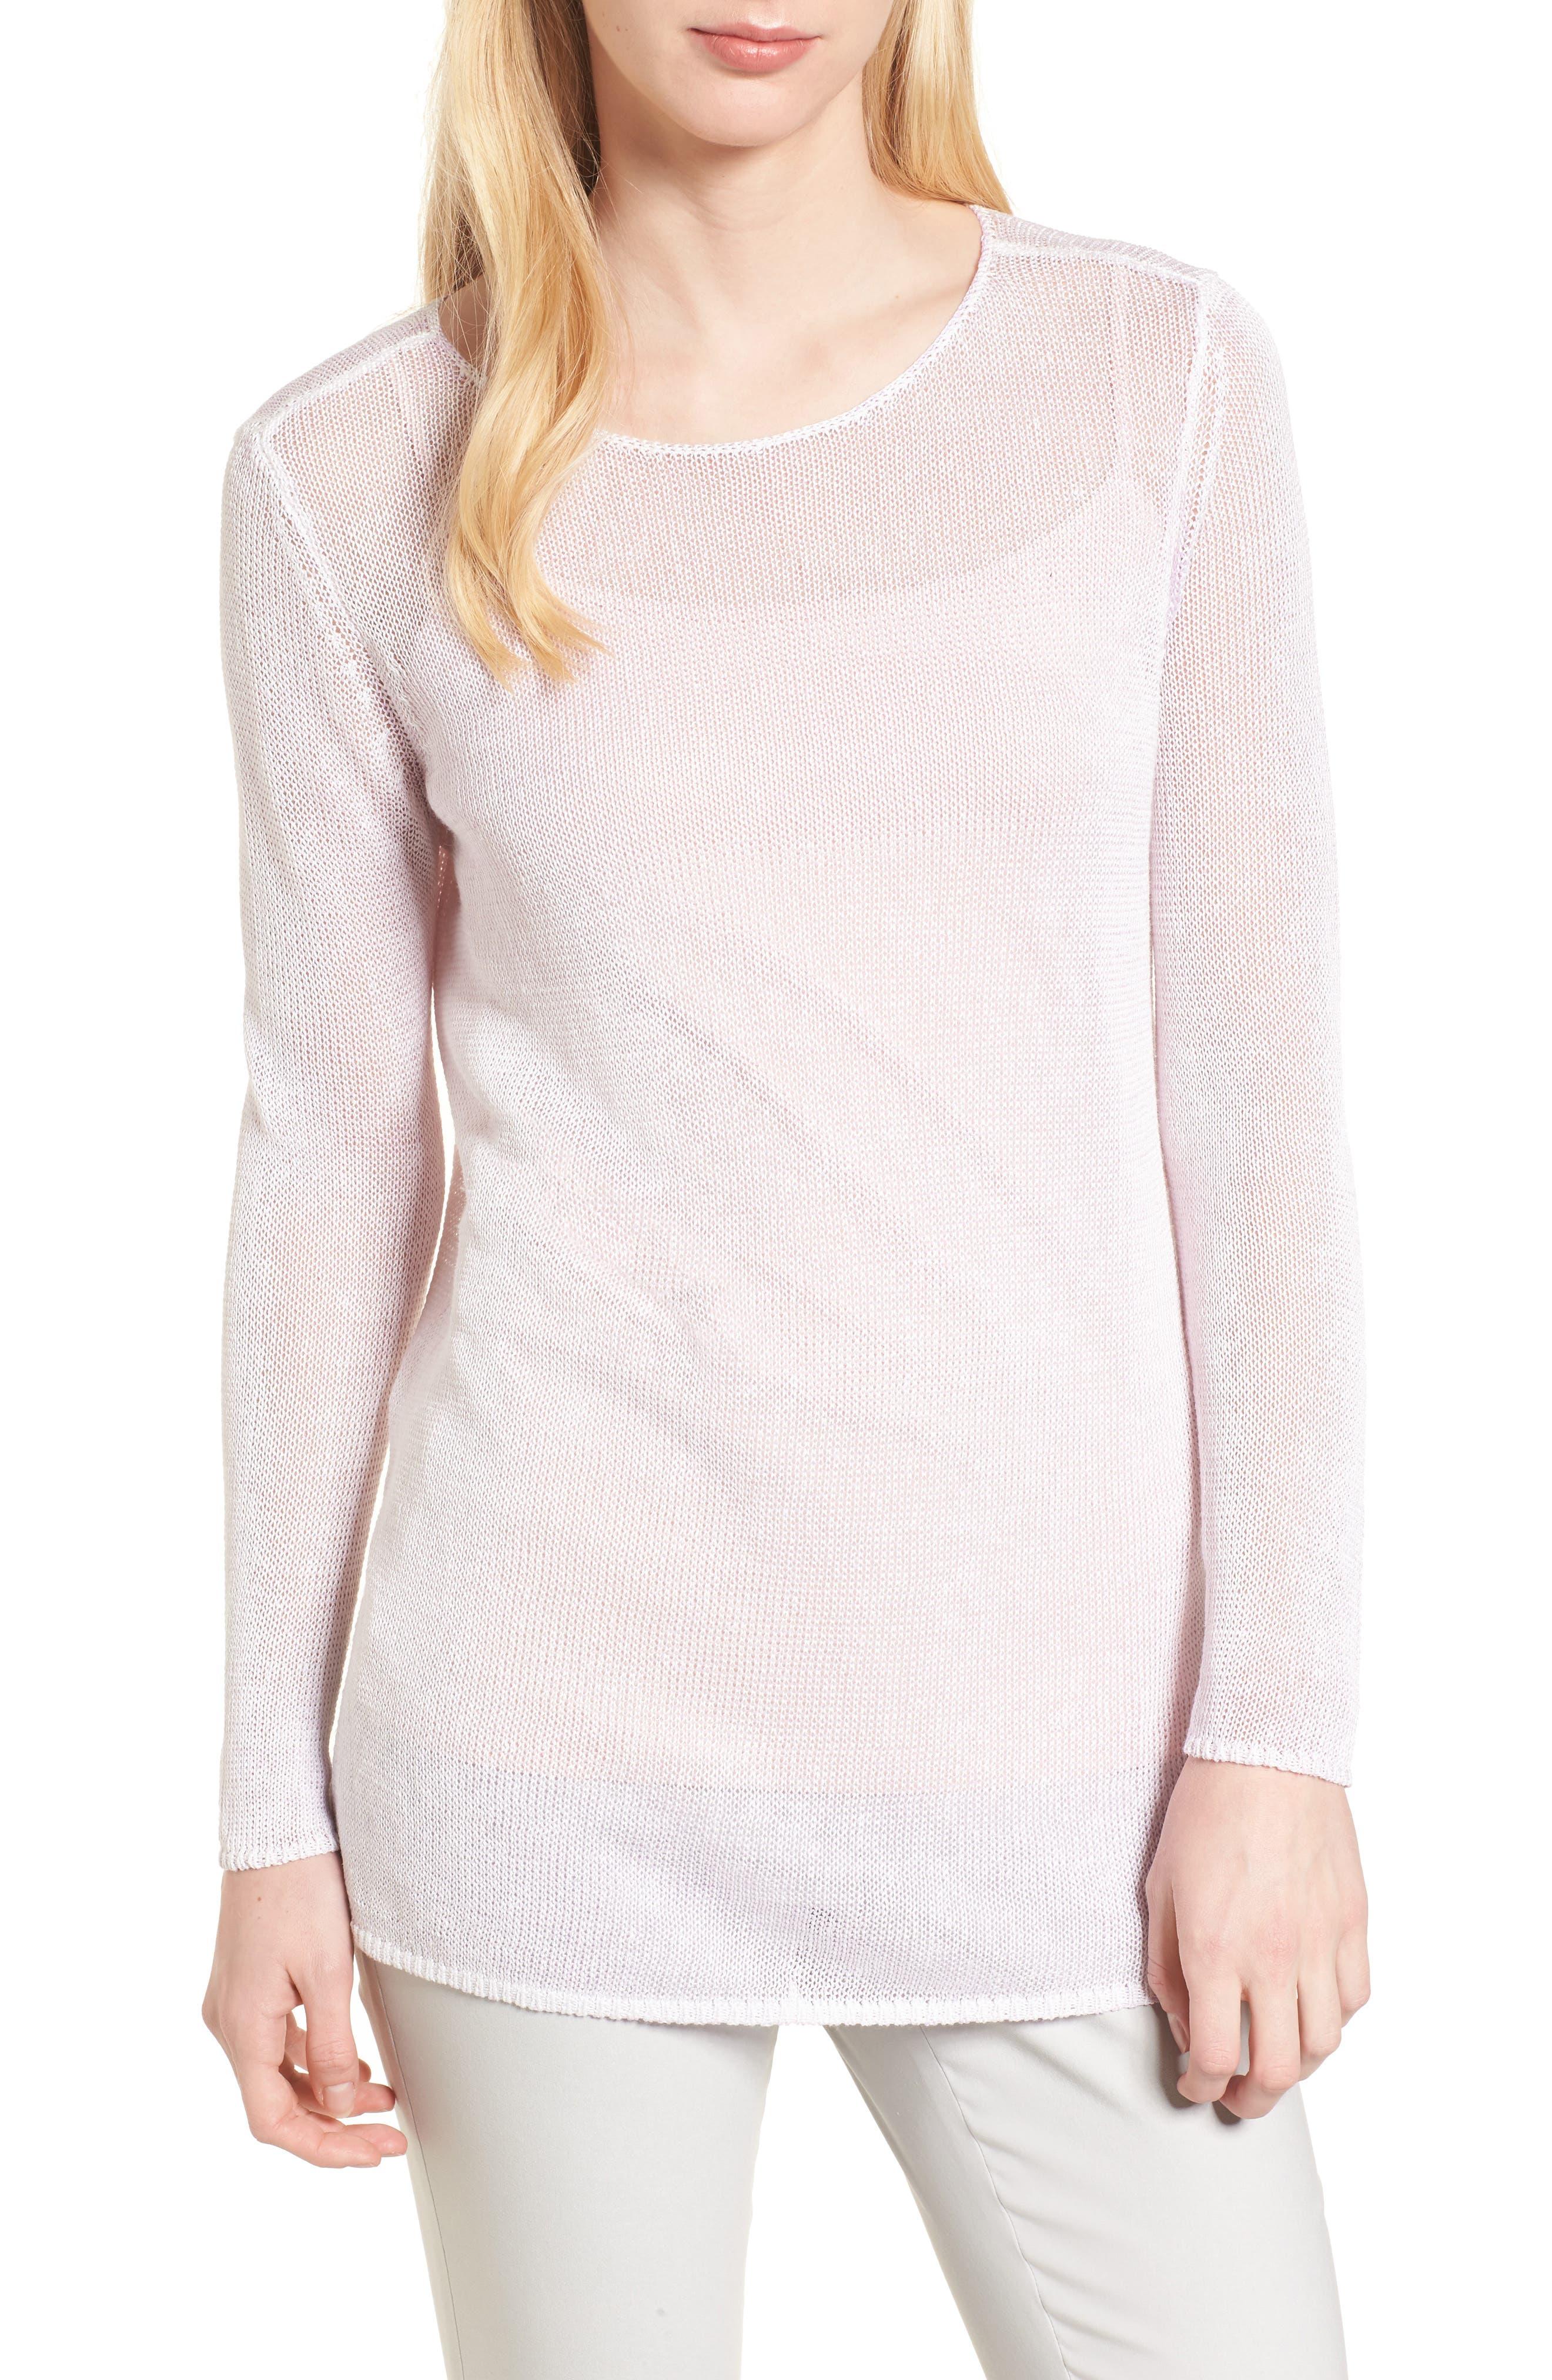 NIC + ZOE Poolside Linen Blend Sweater,                             Main thumbnail 1, color,                             Tea Dust